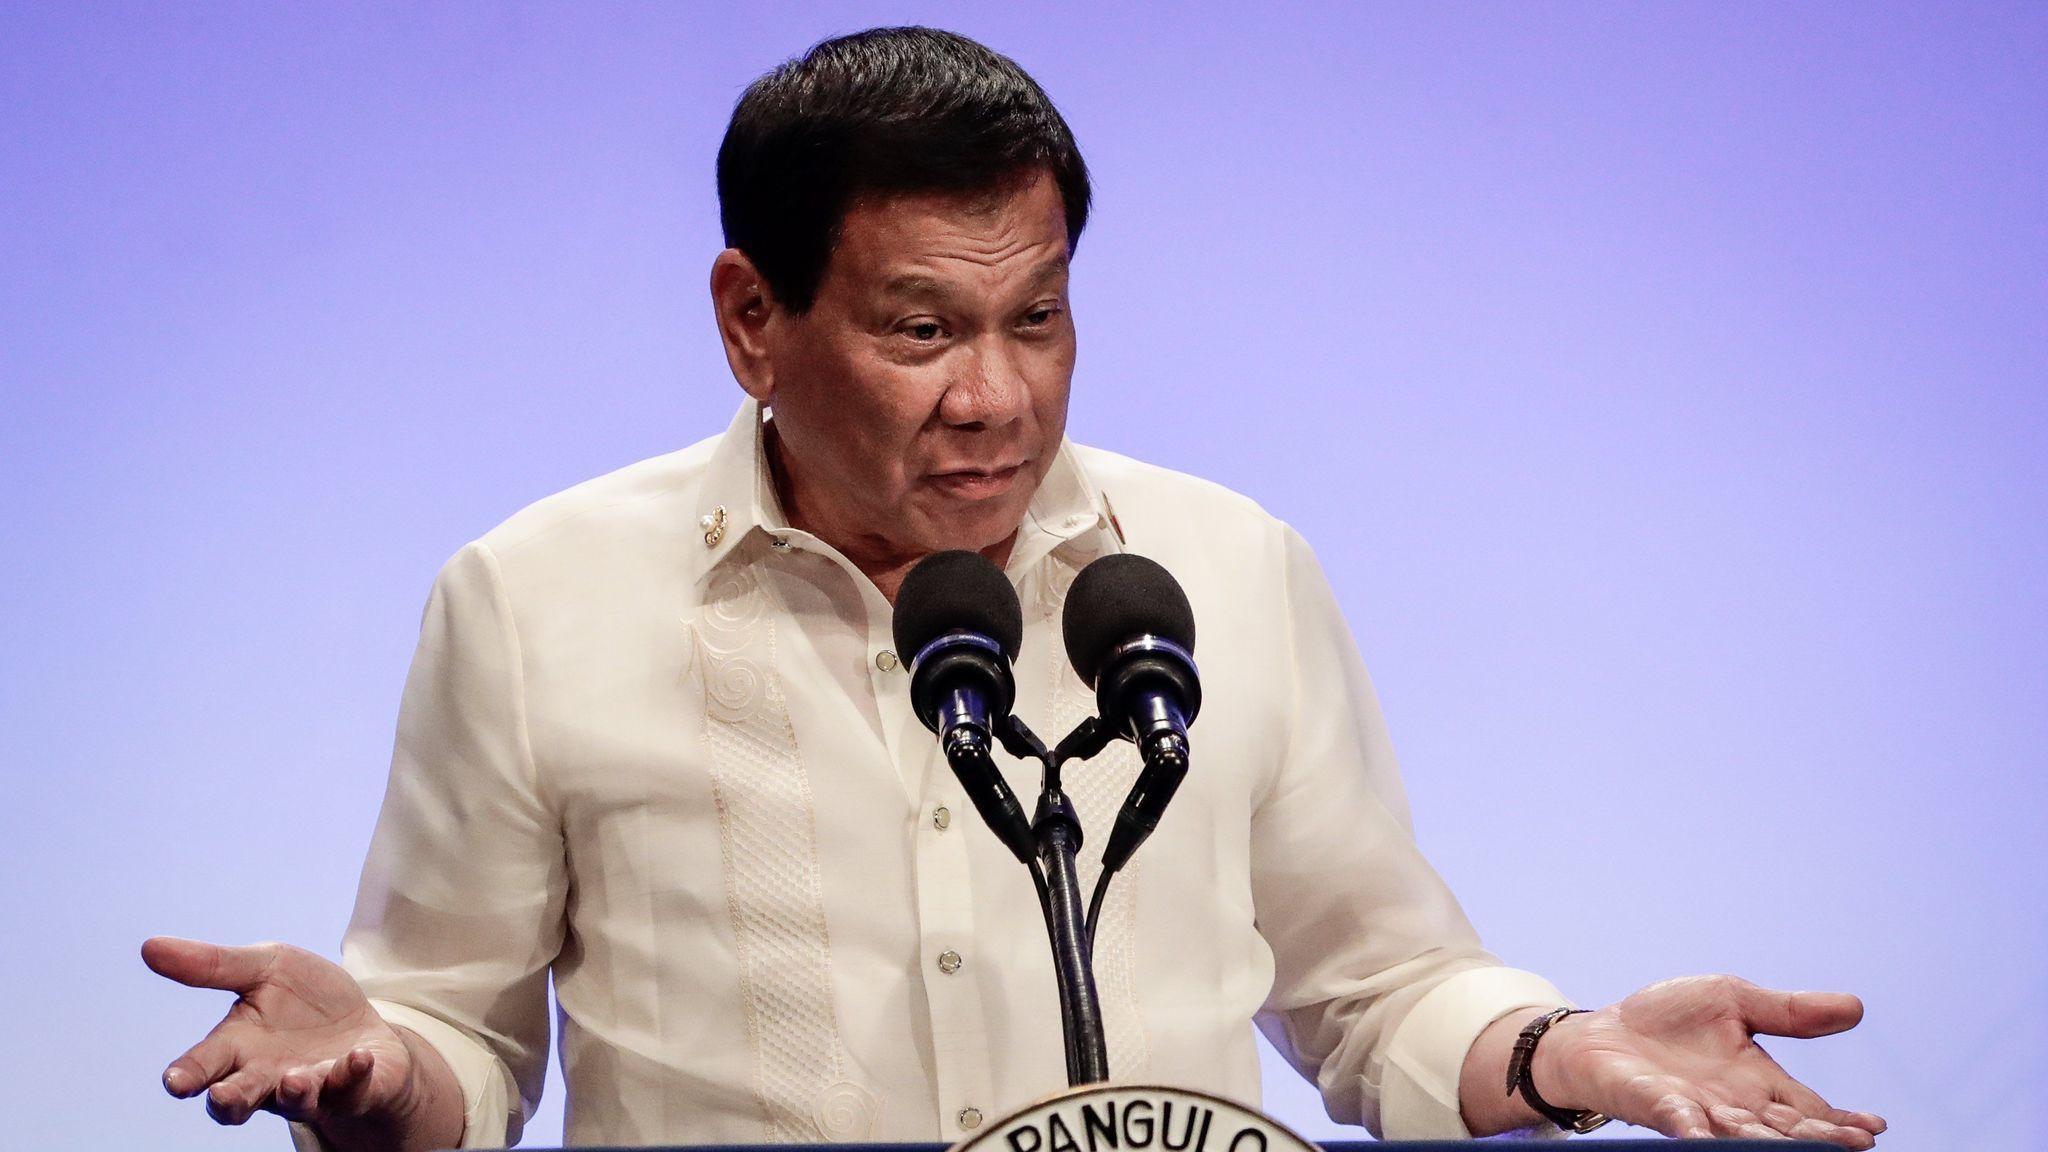 Trump called Kim Jong Un a 'madman,' praised Duterte's handling of drug problem in call